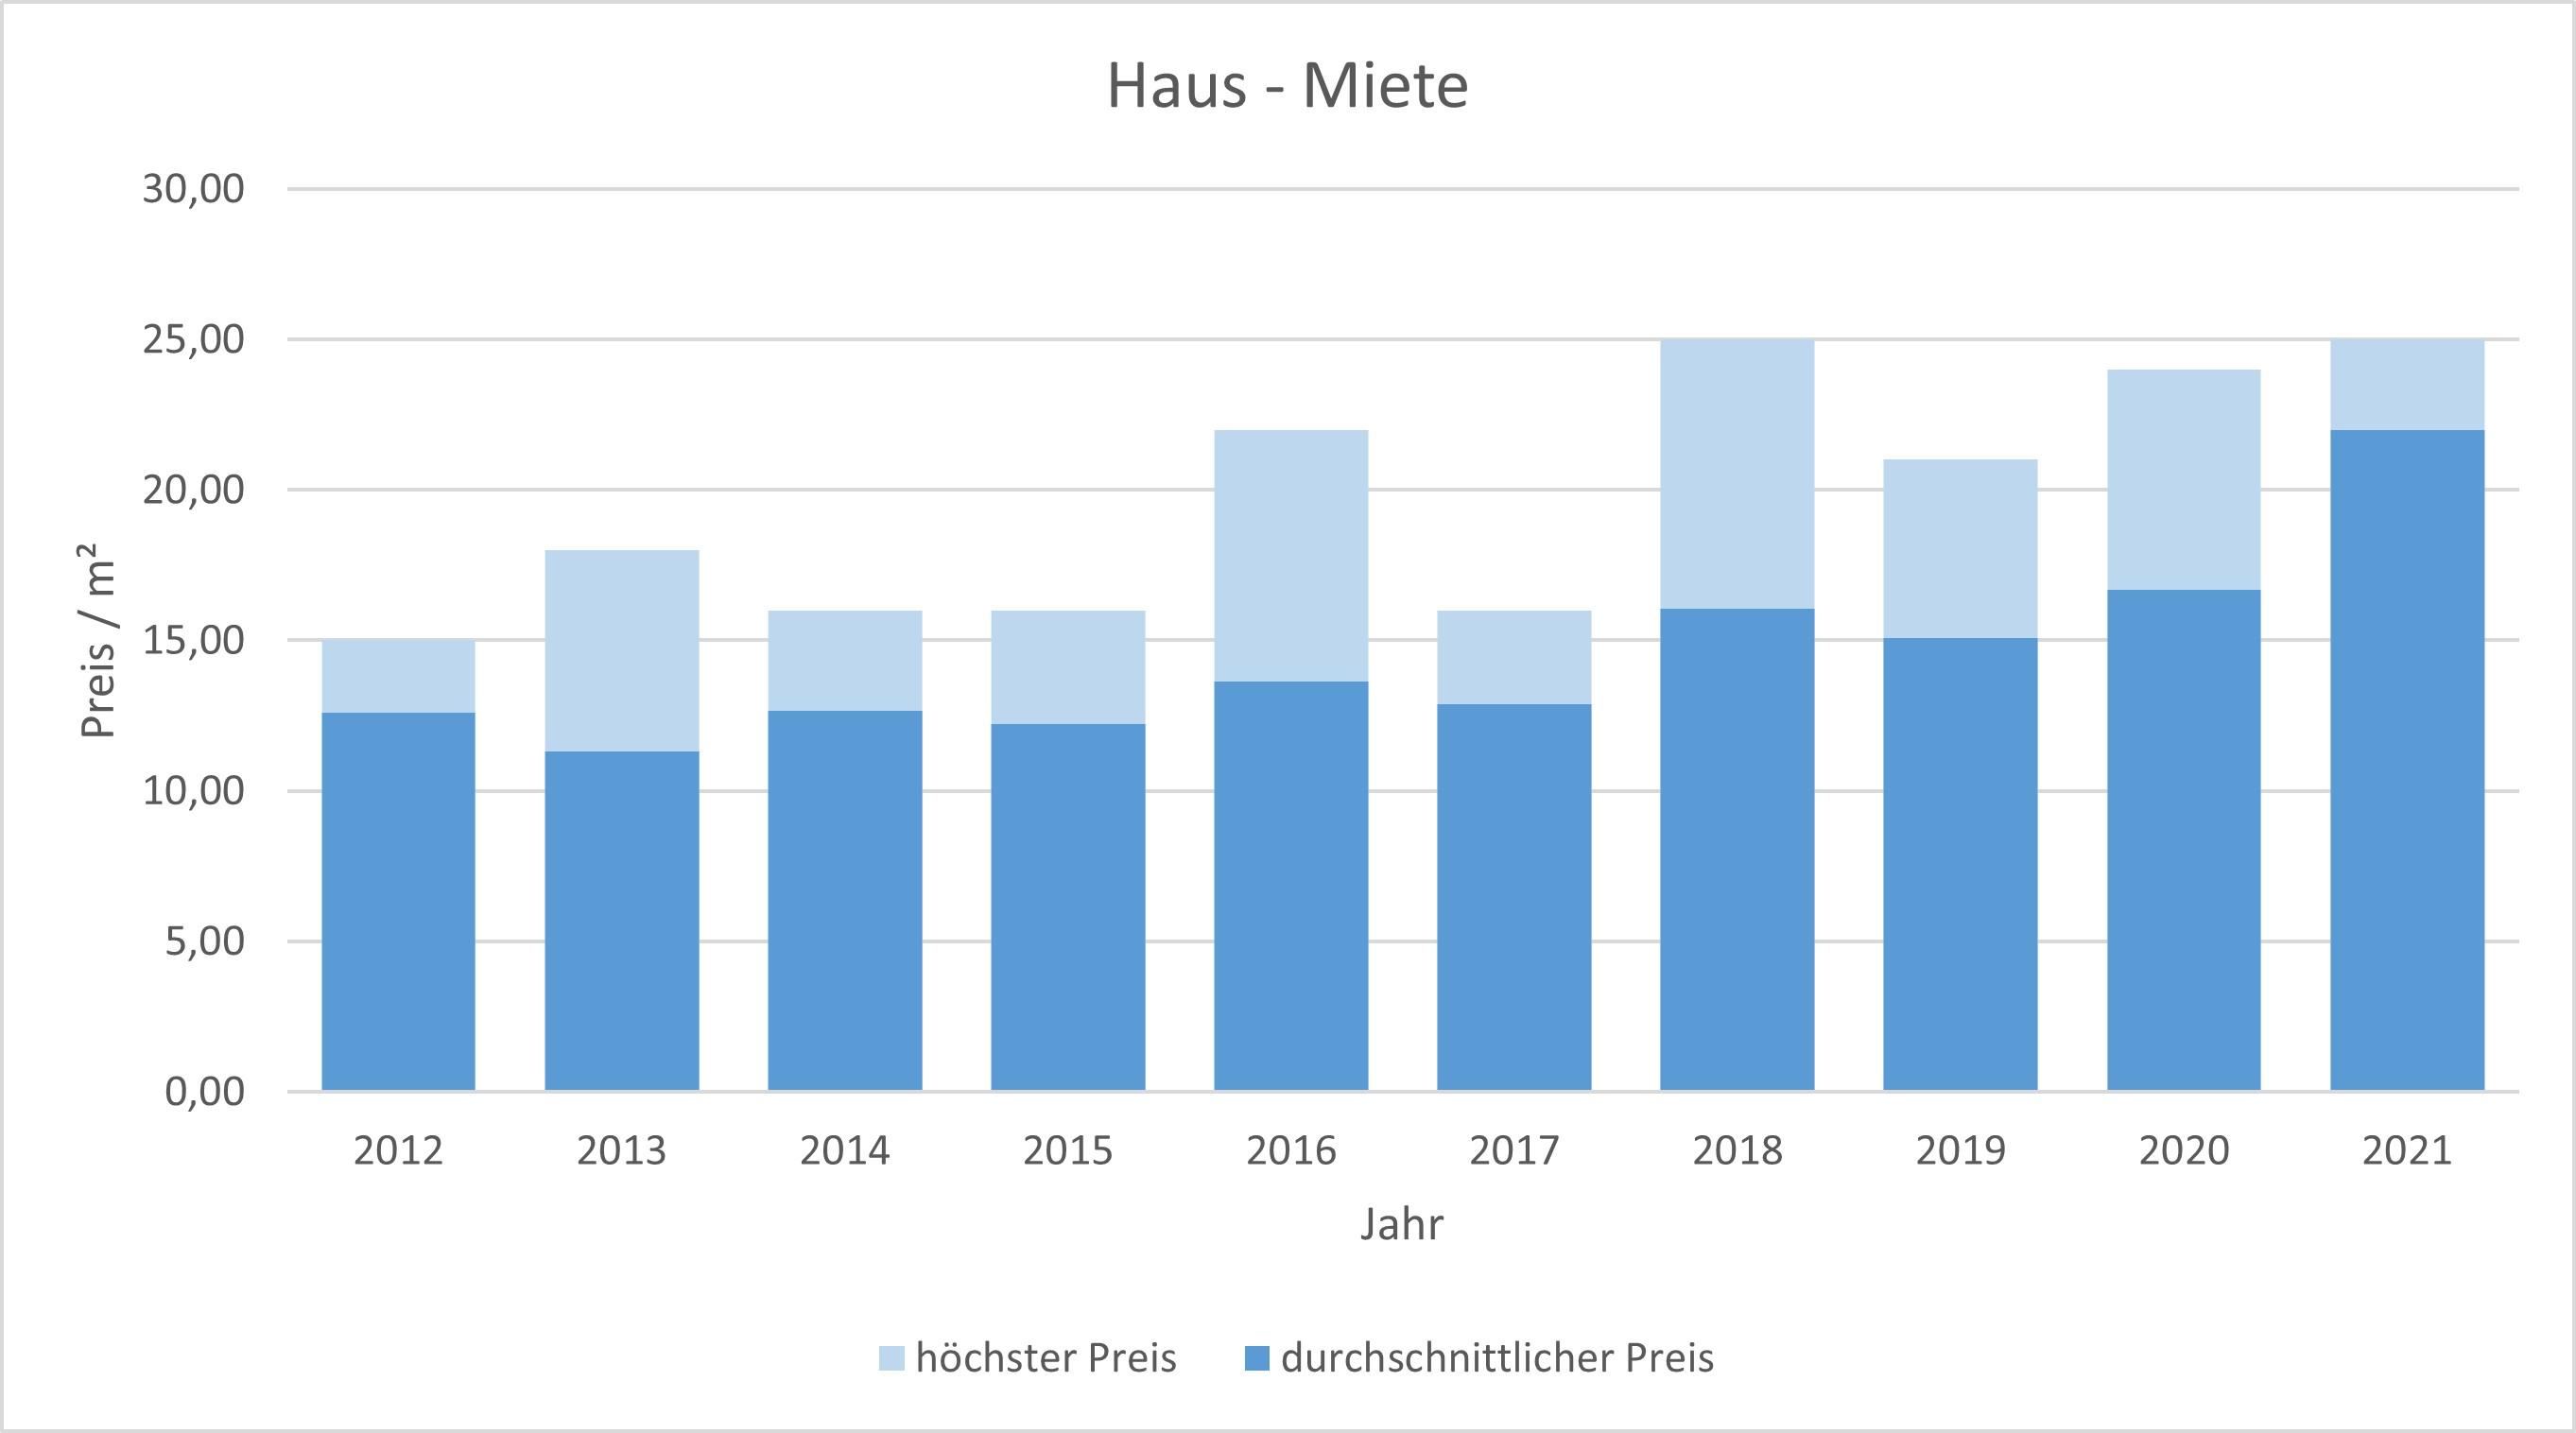 Straßlach - Dingharting Haus mieten vermieten Preis Bewertung Makler 2019 2020 2021 www.happy-immo.de